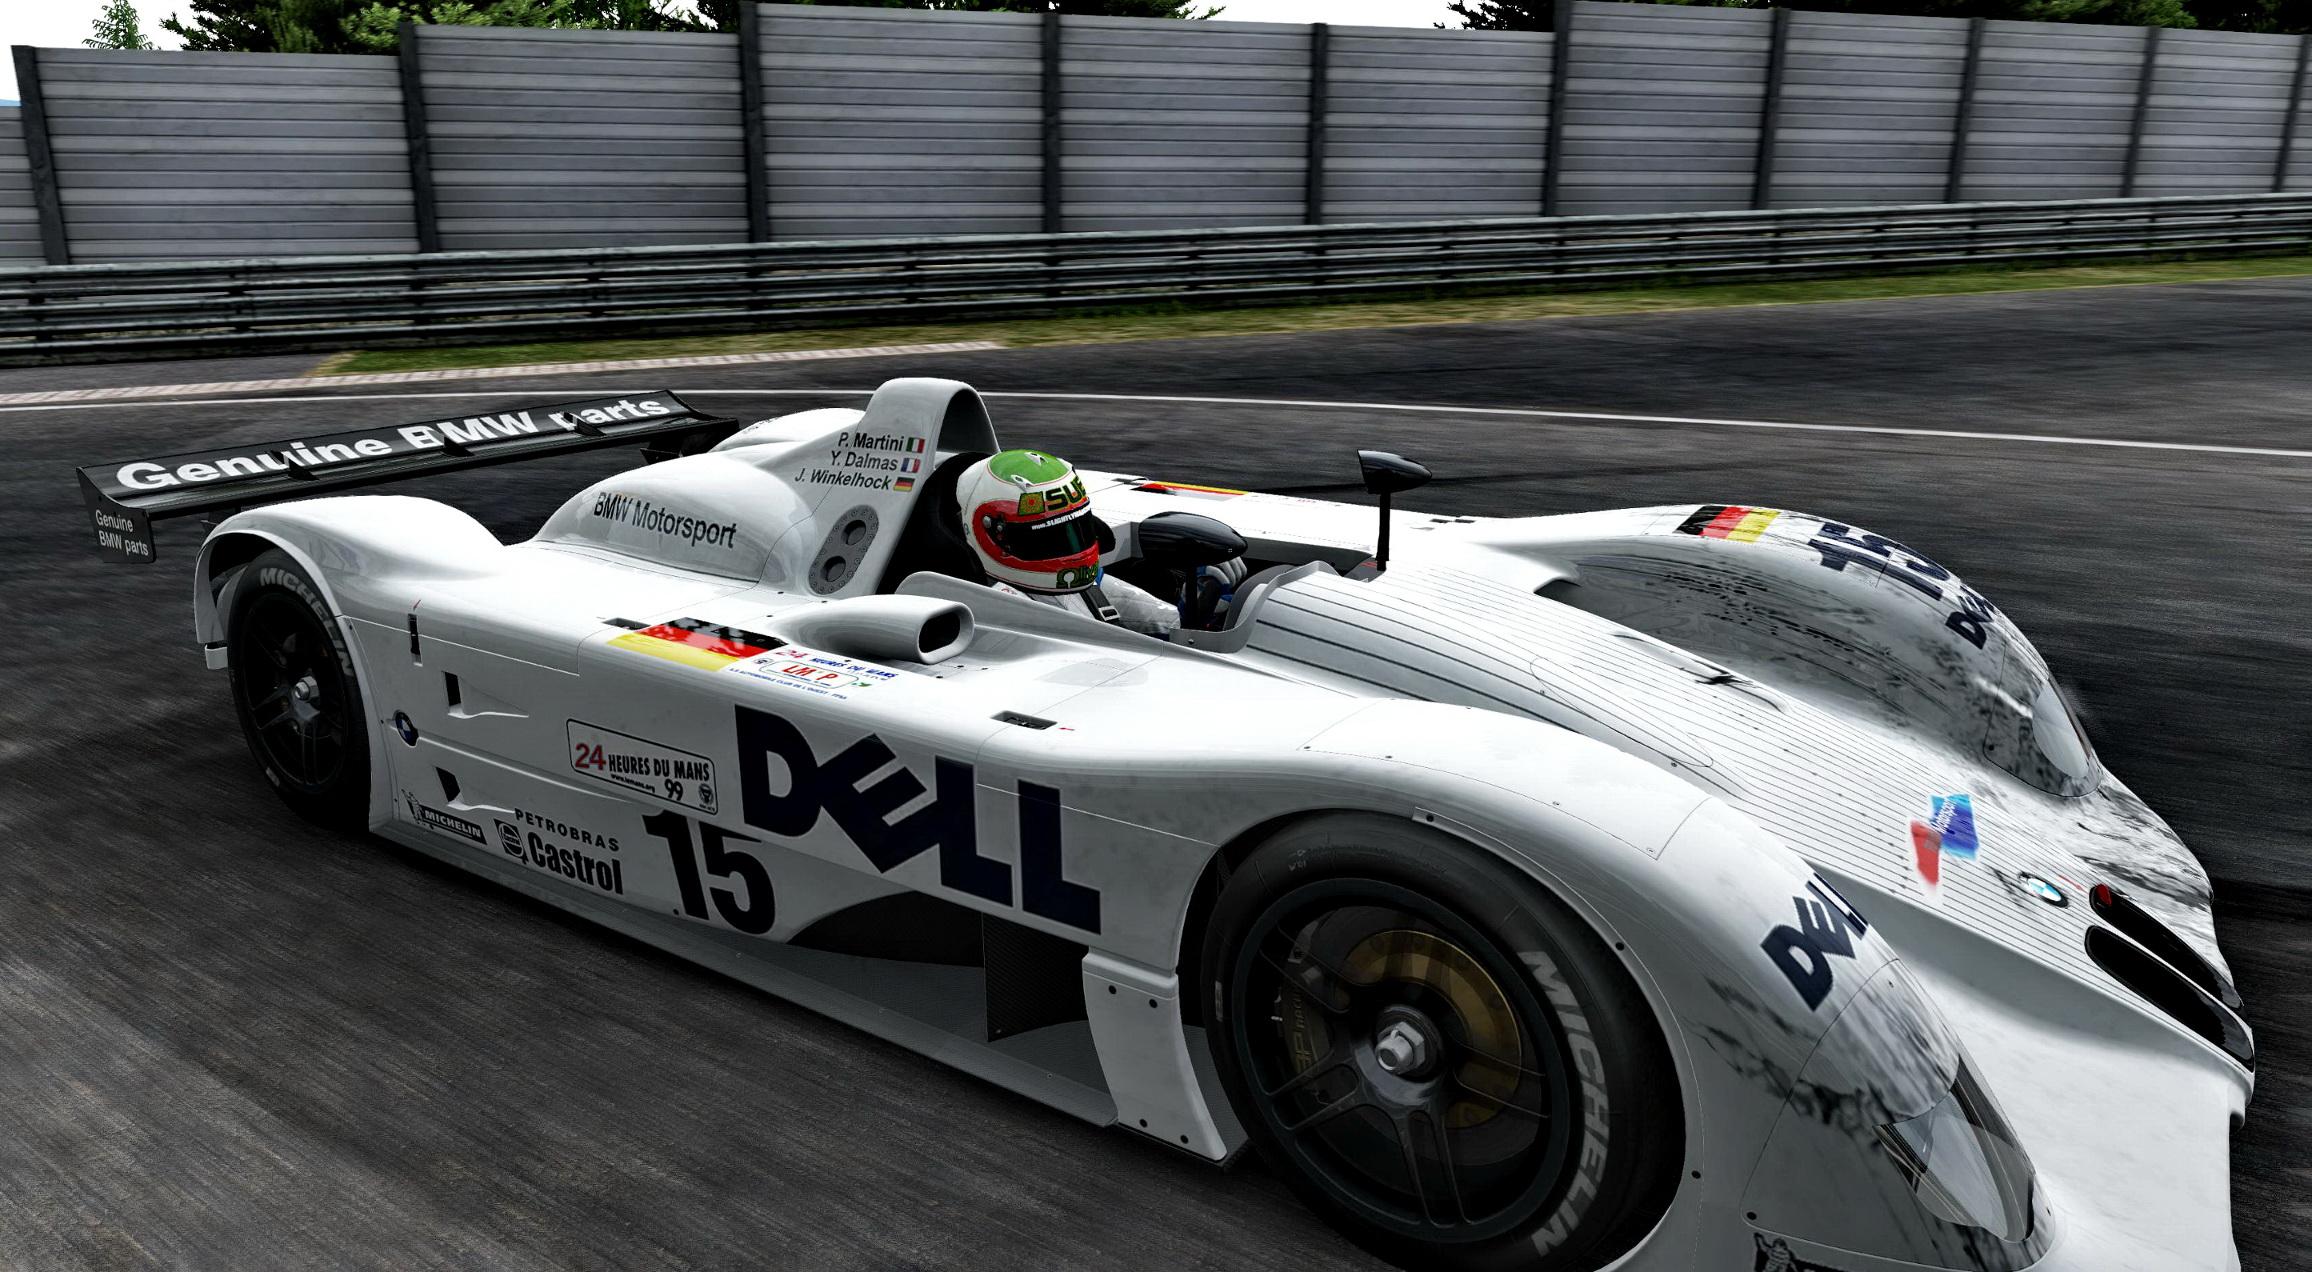 BMW LMP1 'Dell' 15_020.jpg